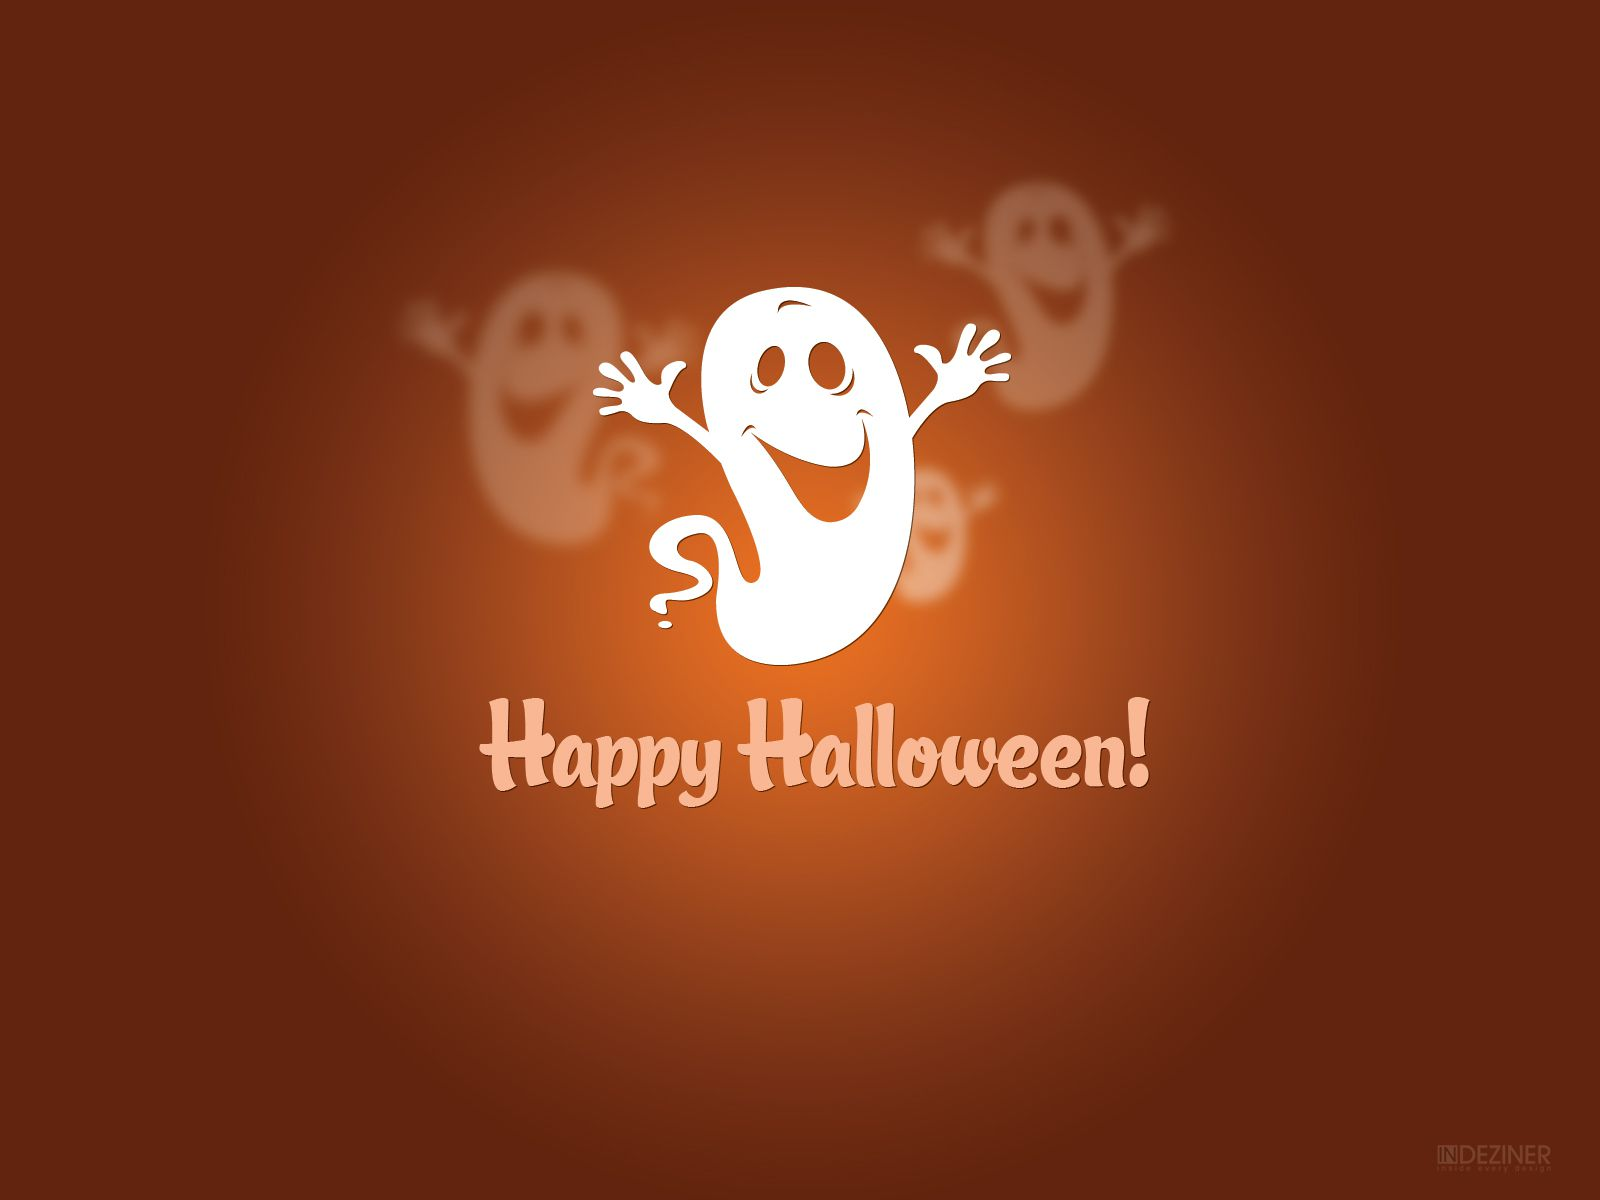 45 spooky and fun halloween wallpapers - Funny happy halloween wallpaper ...